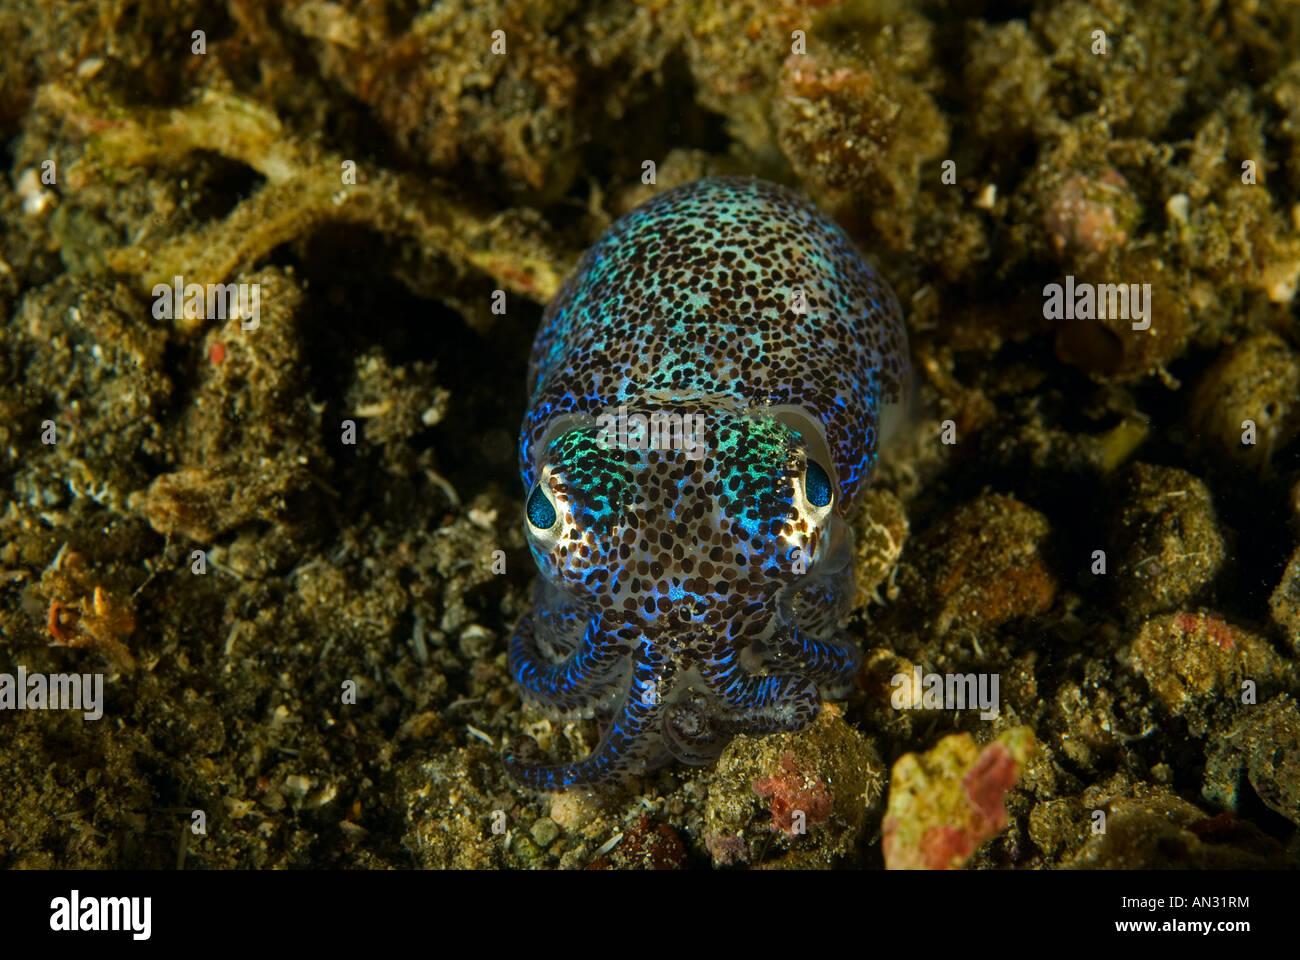 Bobtail squid Euprymna berryi Komodo National Park Indonesia - Stock Image